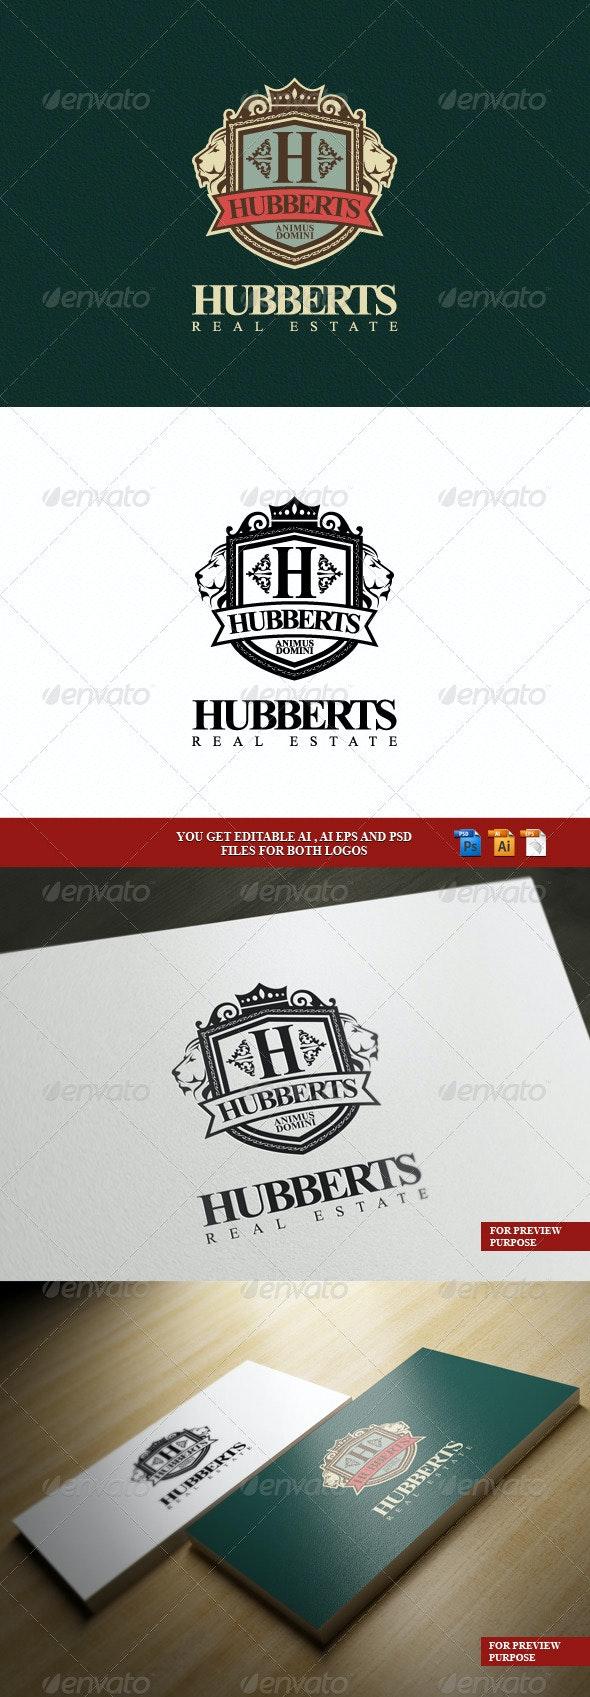 Hubberts Royal Crest Logo - Crests Logo Templates